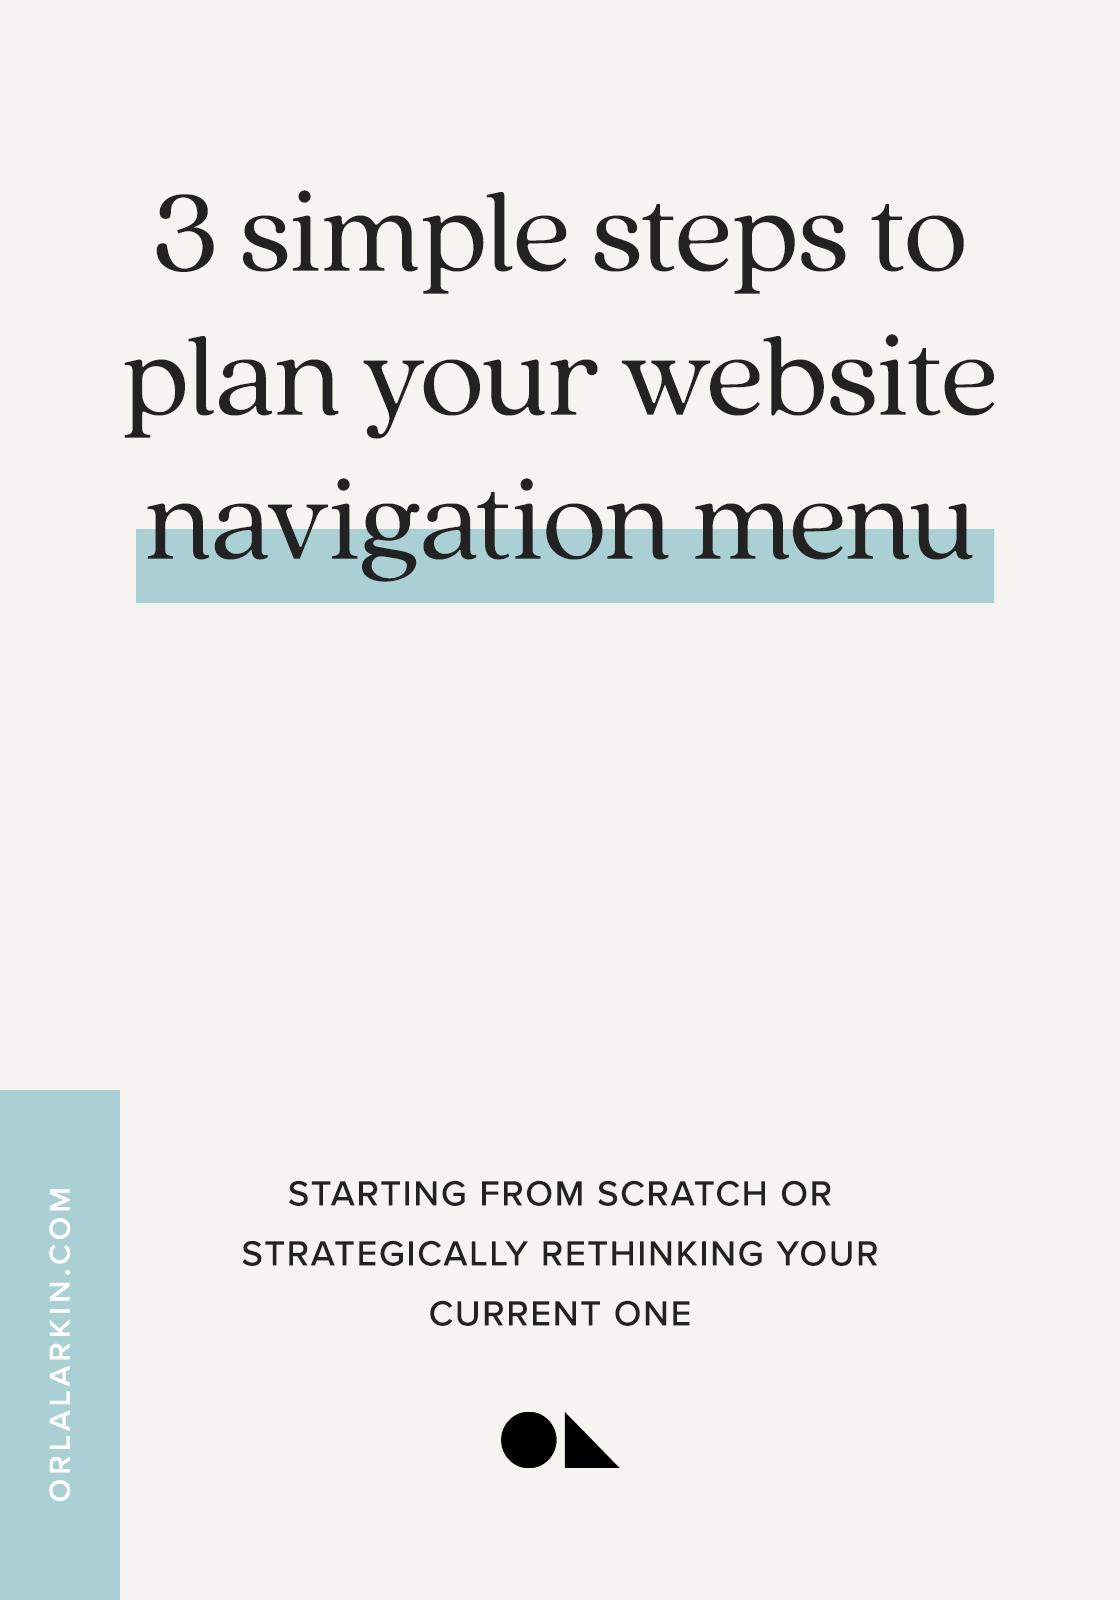 3 simple steps to plan your website navigation menu